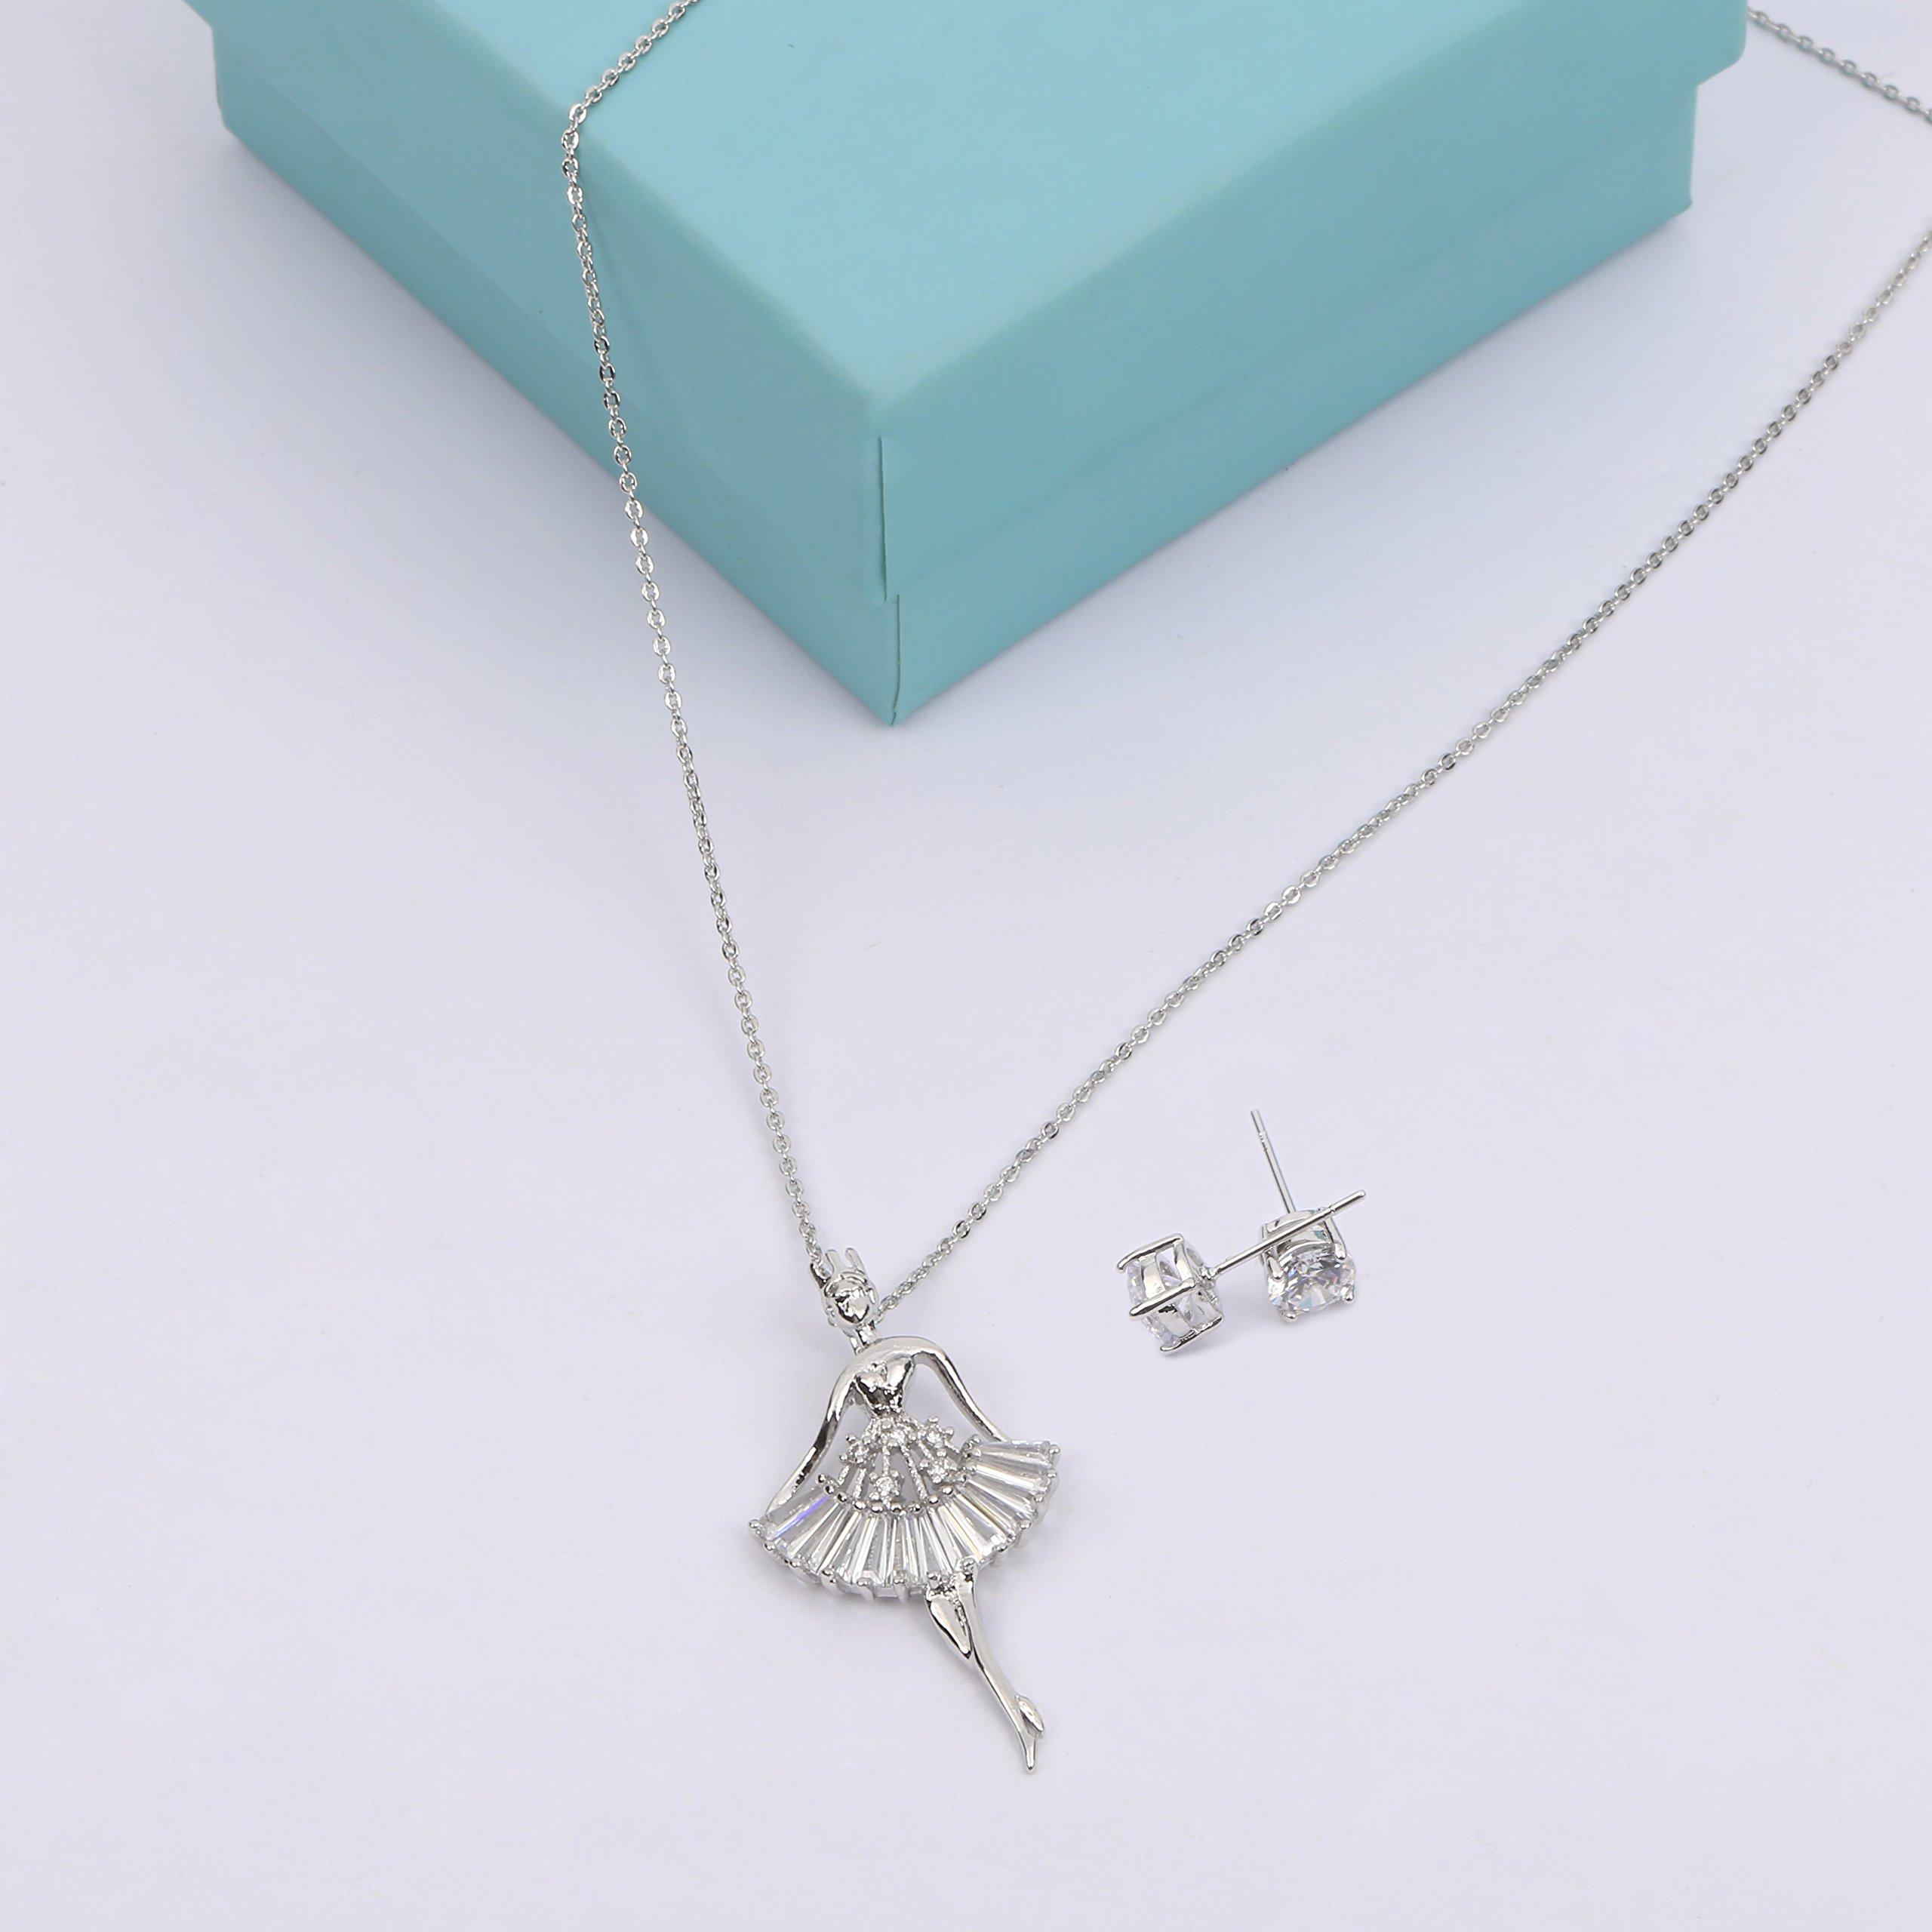 MYKEA Elegant Jewelry Set for Women 18K White Gold Ballerina Girl Pendant Necklace with Cubic Zirconia Stud Earrings for Teen Girls Jewelry by MYKEA (Image #2)